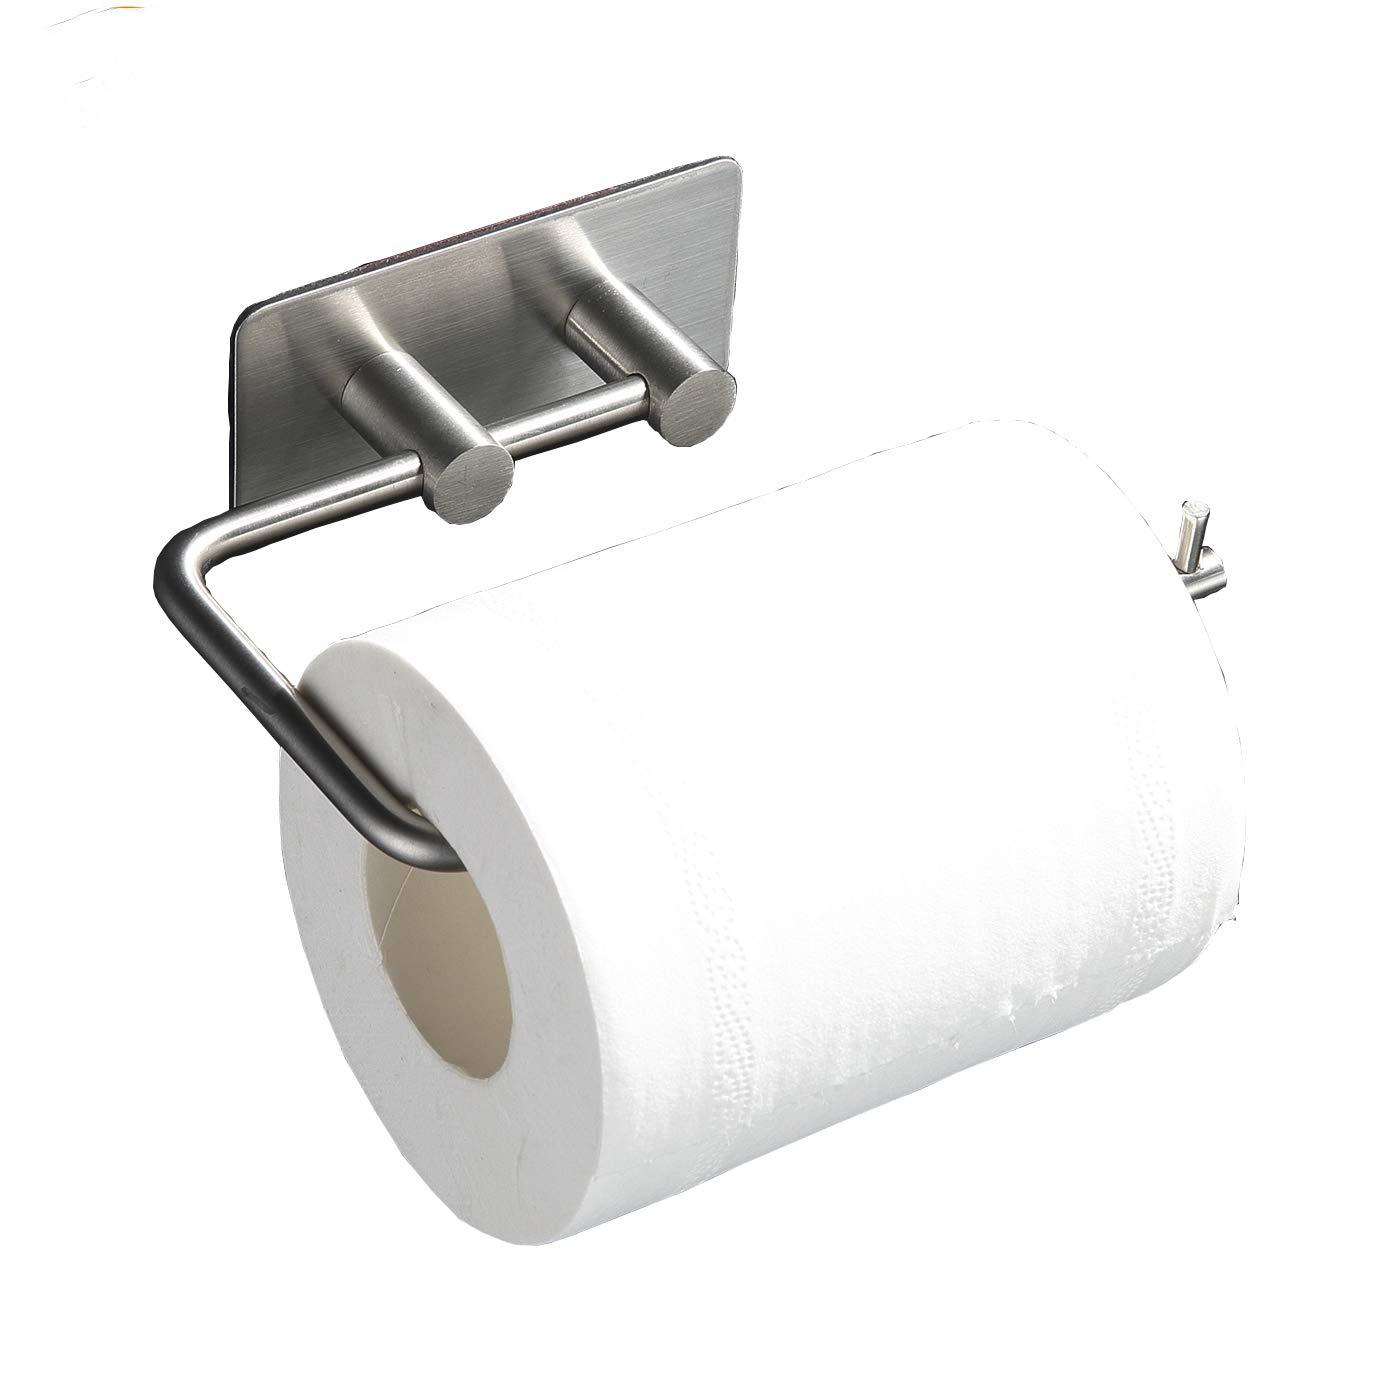 Judeen Sticky Self Adhesive Toilet Tissue Paper Roll Storage Holder, SUS 304 Stainless Steel Toilet Paper Hanger, Kitchen Bathroom Towel Dispenser, Brushed Finish